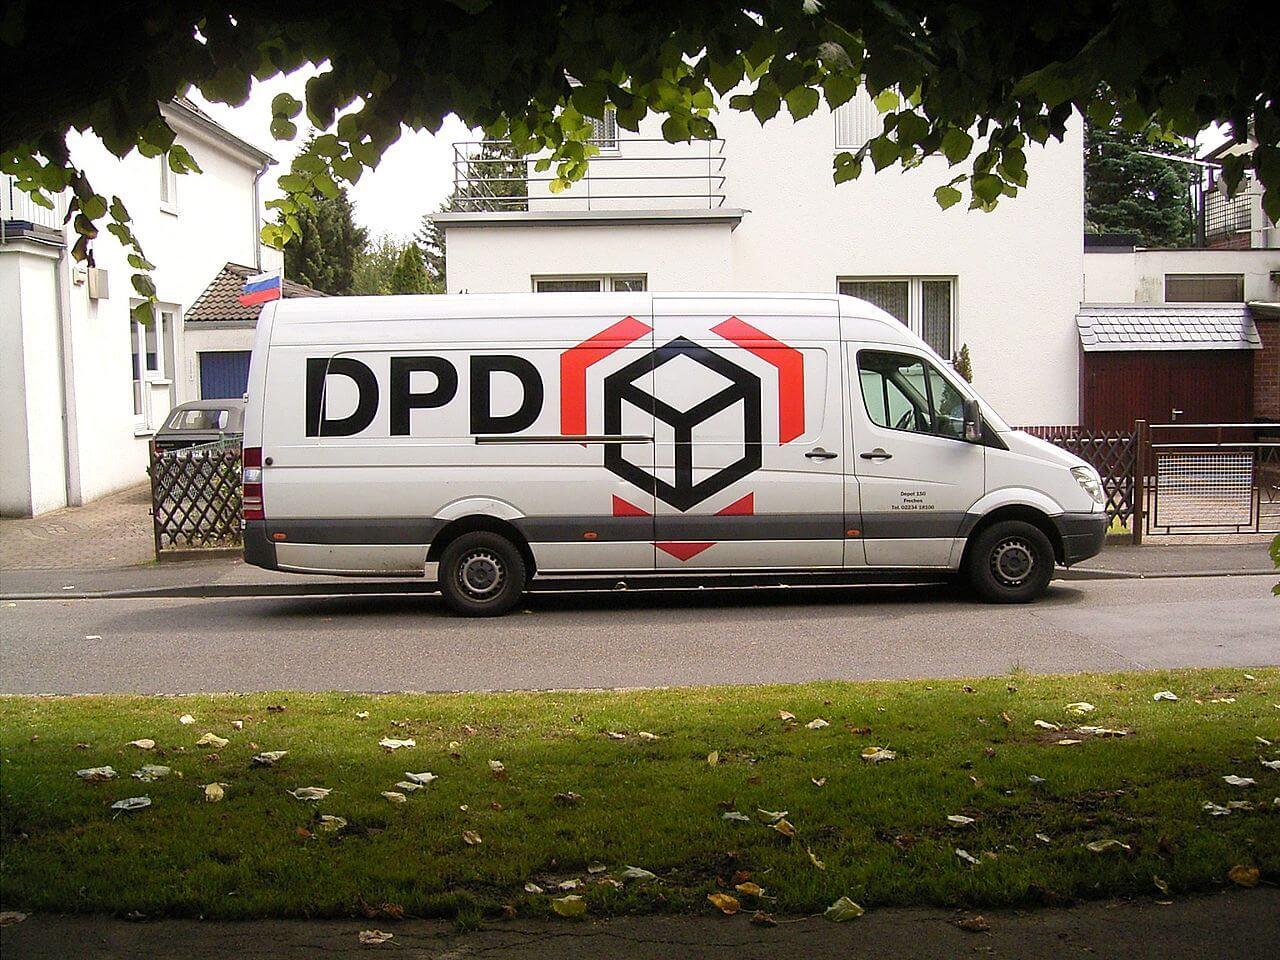 1280px-DPD_01_ies